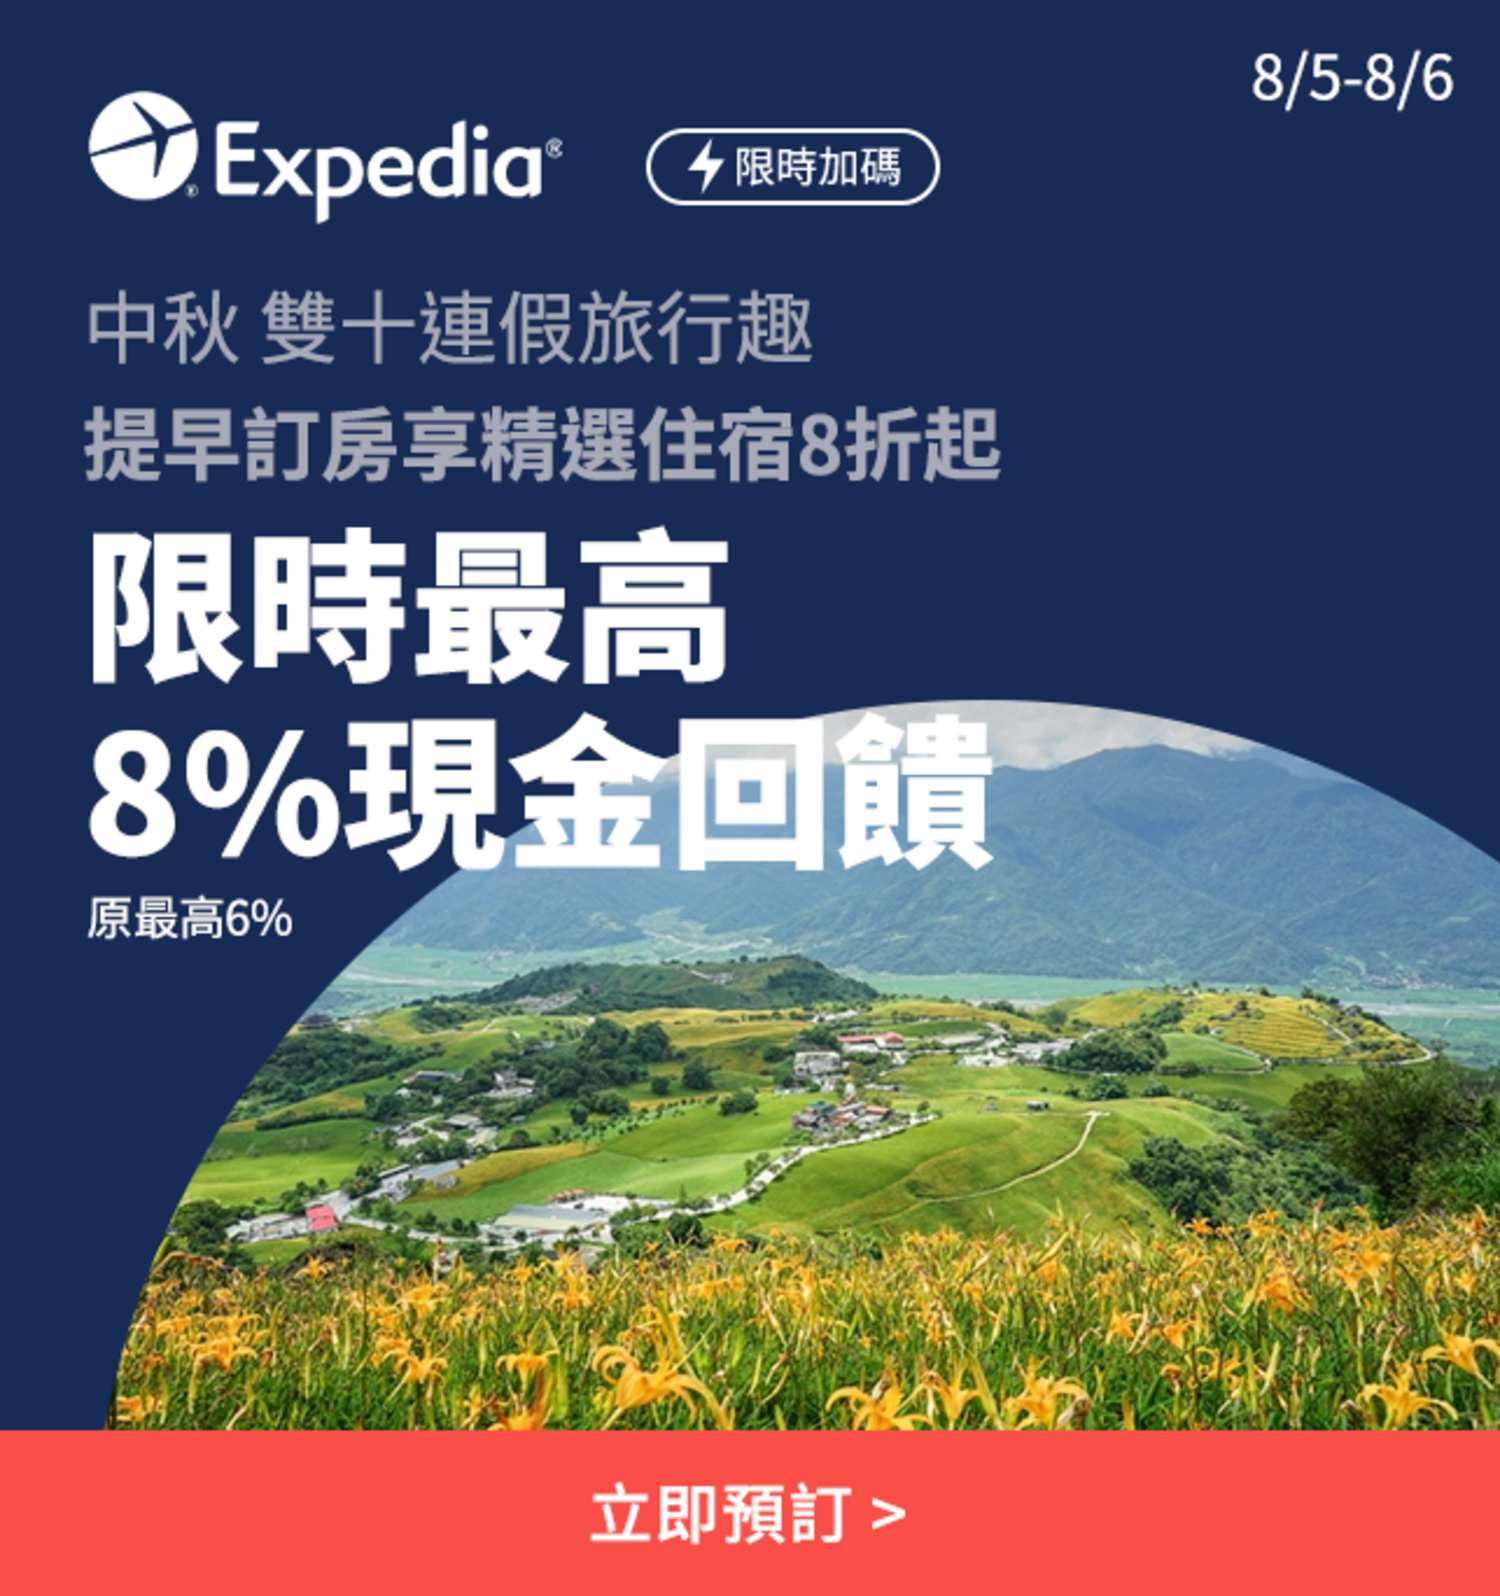 expedia 加碼最高8% 8/5-8/6